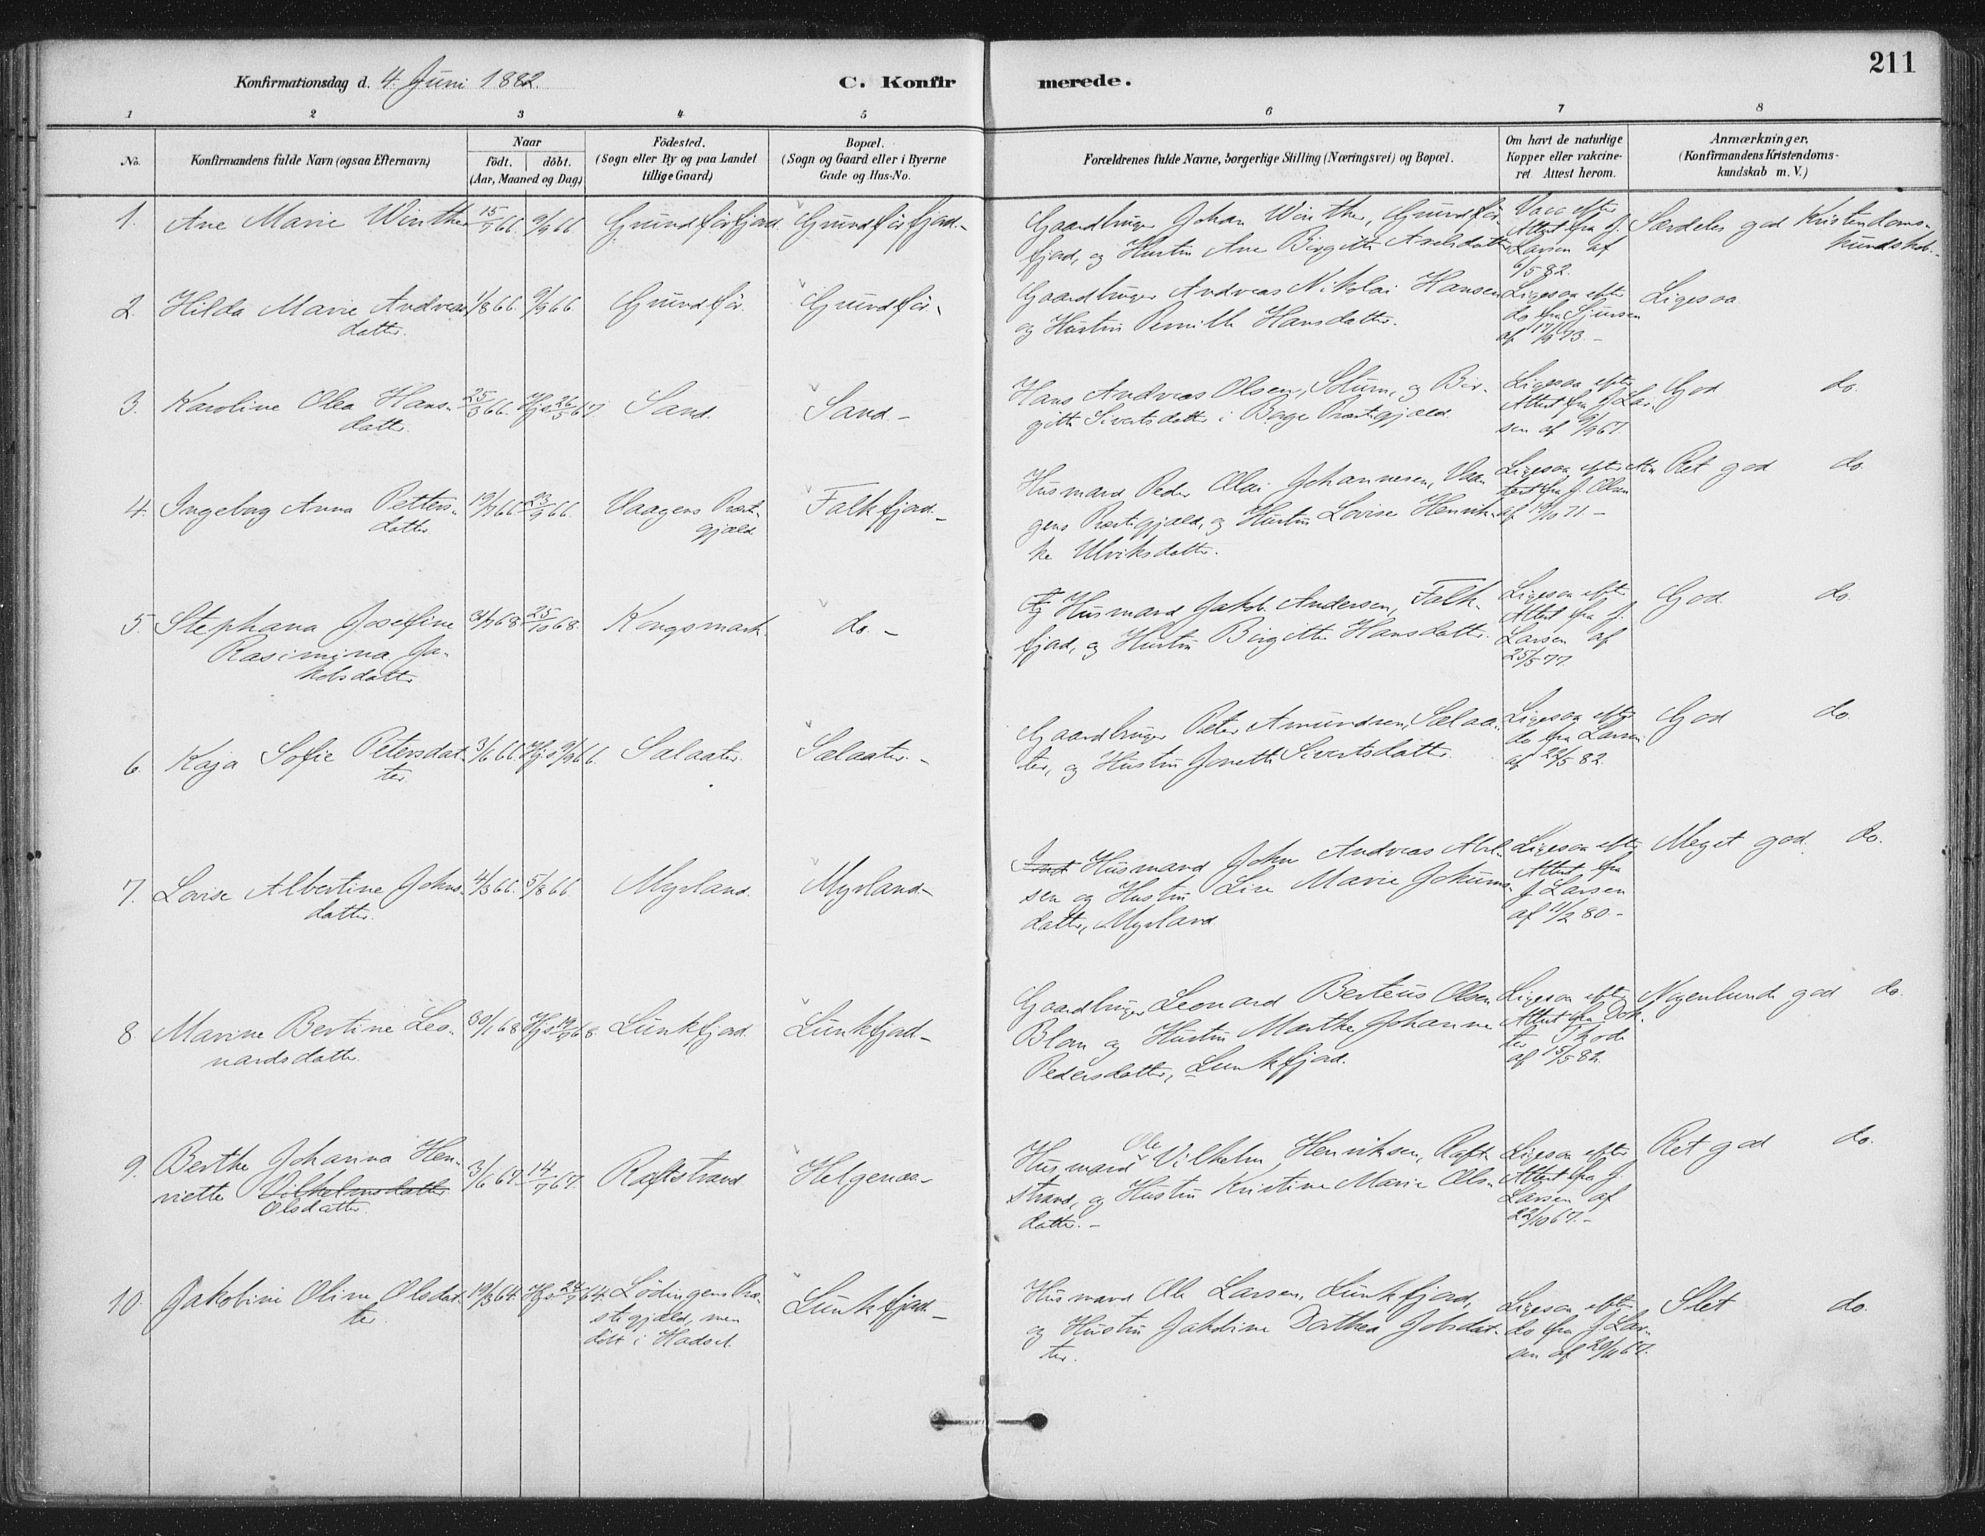 SAT, Ministerialprotokoller, klokkerbøker og fødselsregistre - Nordland, 888/L1244: Ministerialbok nr. 888A10, 1880-1890, s. 211